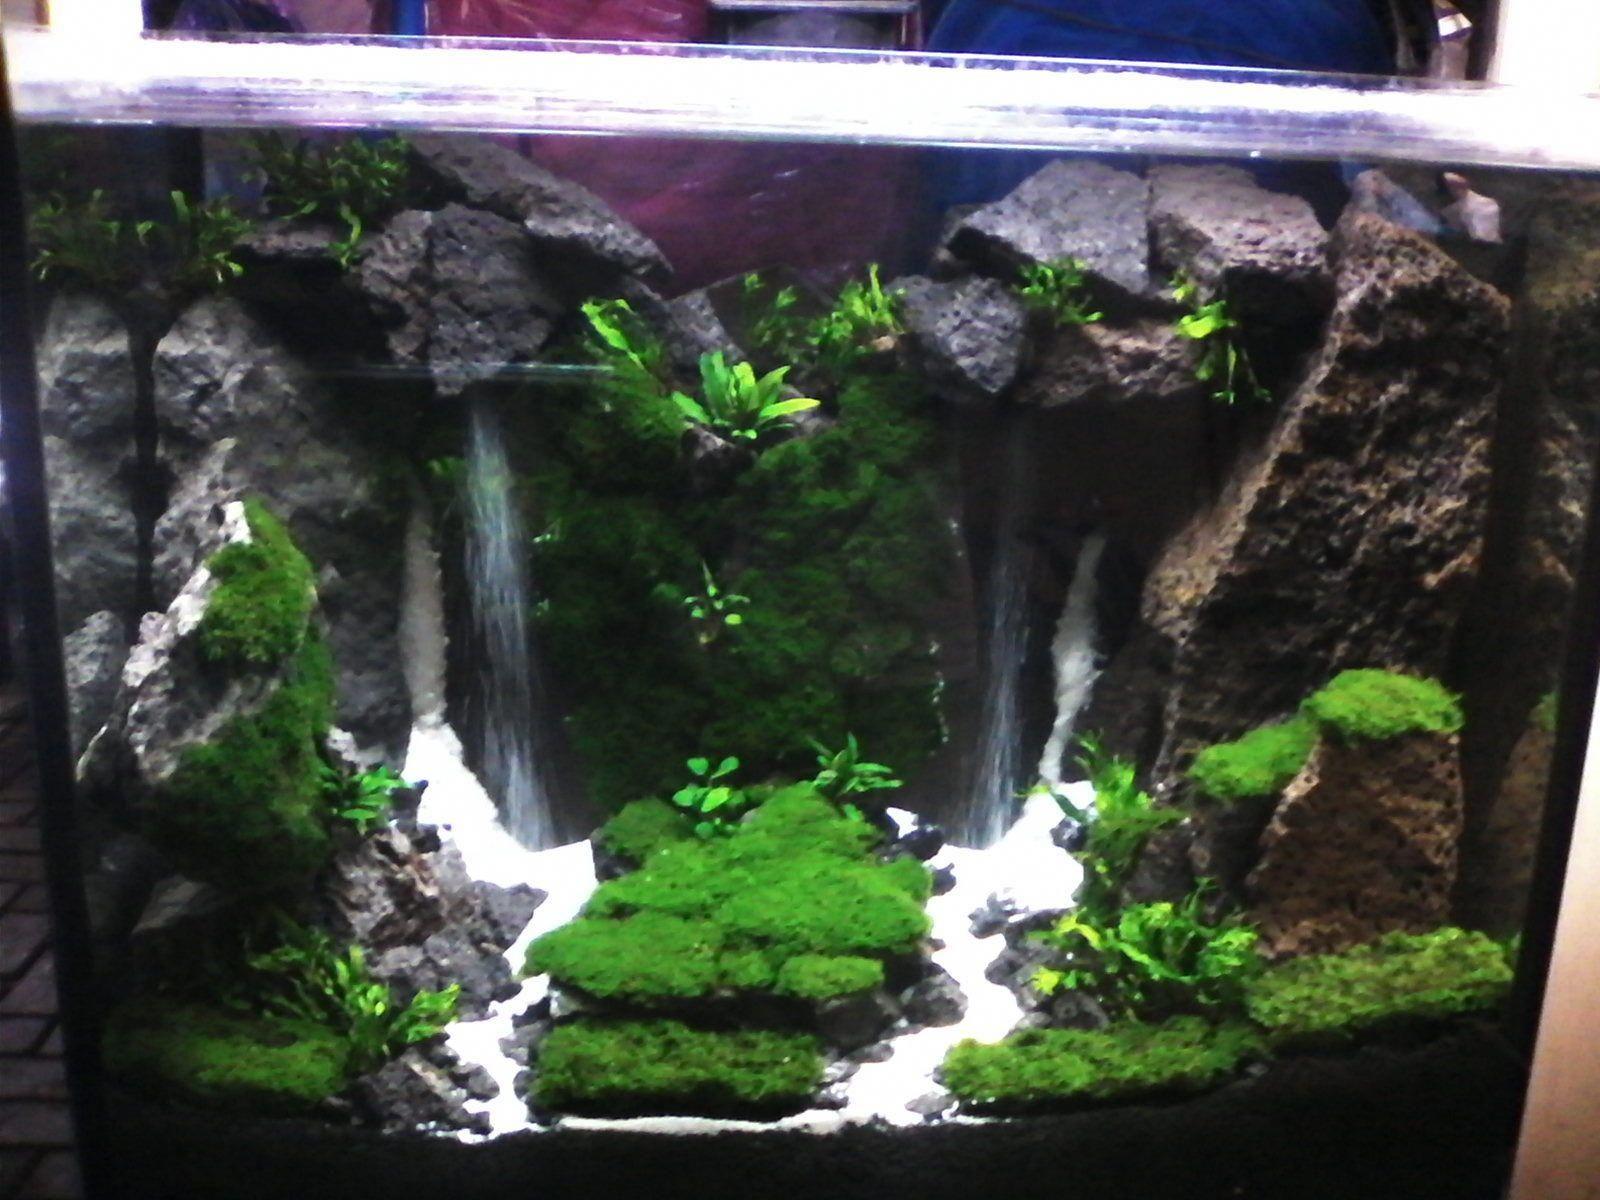 Tutorial Cara Membuat Tanaman Hias Di Dalam Aquarium Selamat Datang Di Dunia Satwa Kali Ini Admin Mau Berb Aquarium Backgrounds Aquarium Set Saltwater Tank